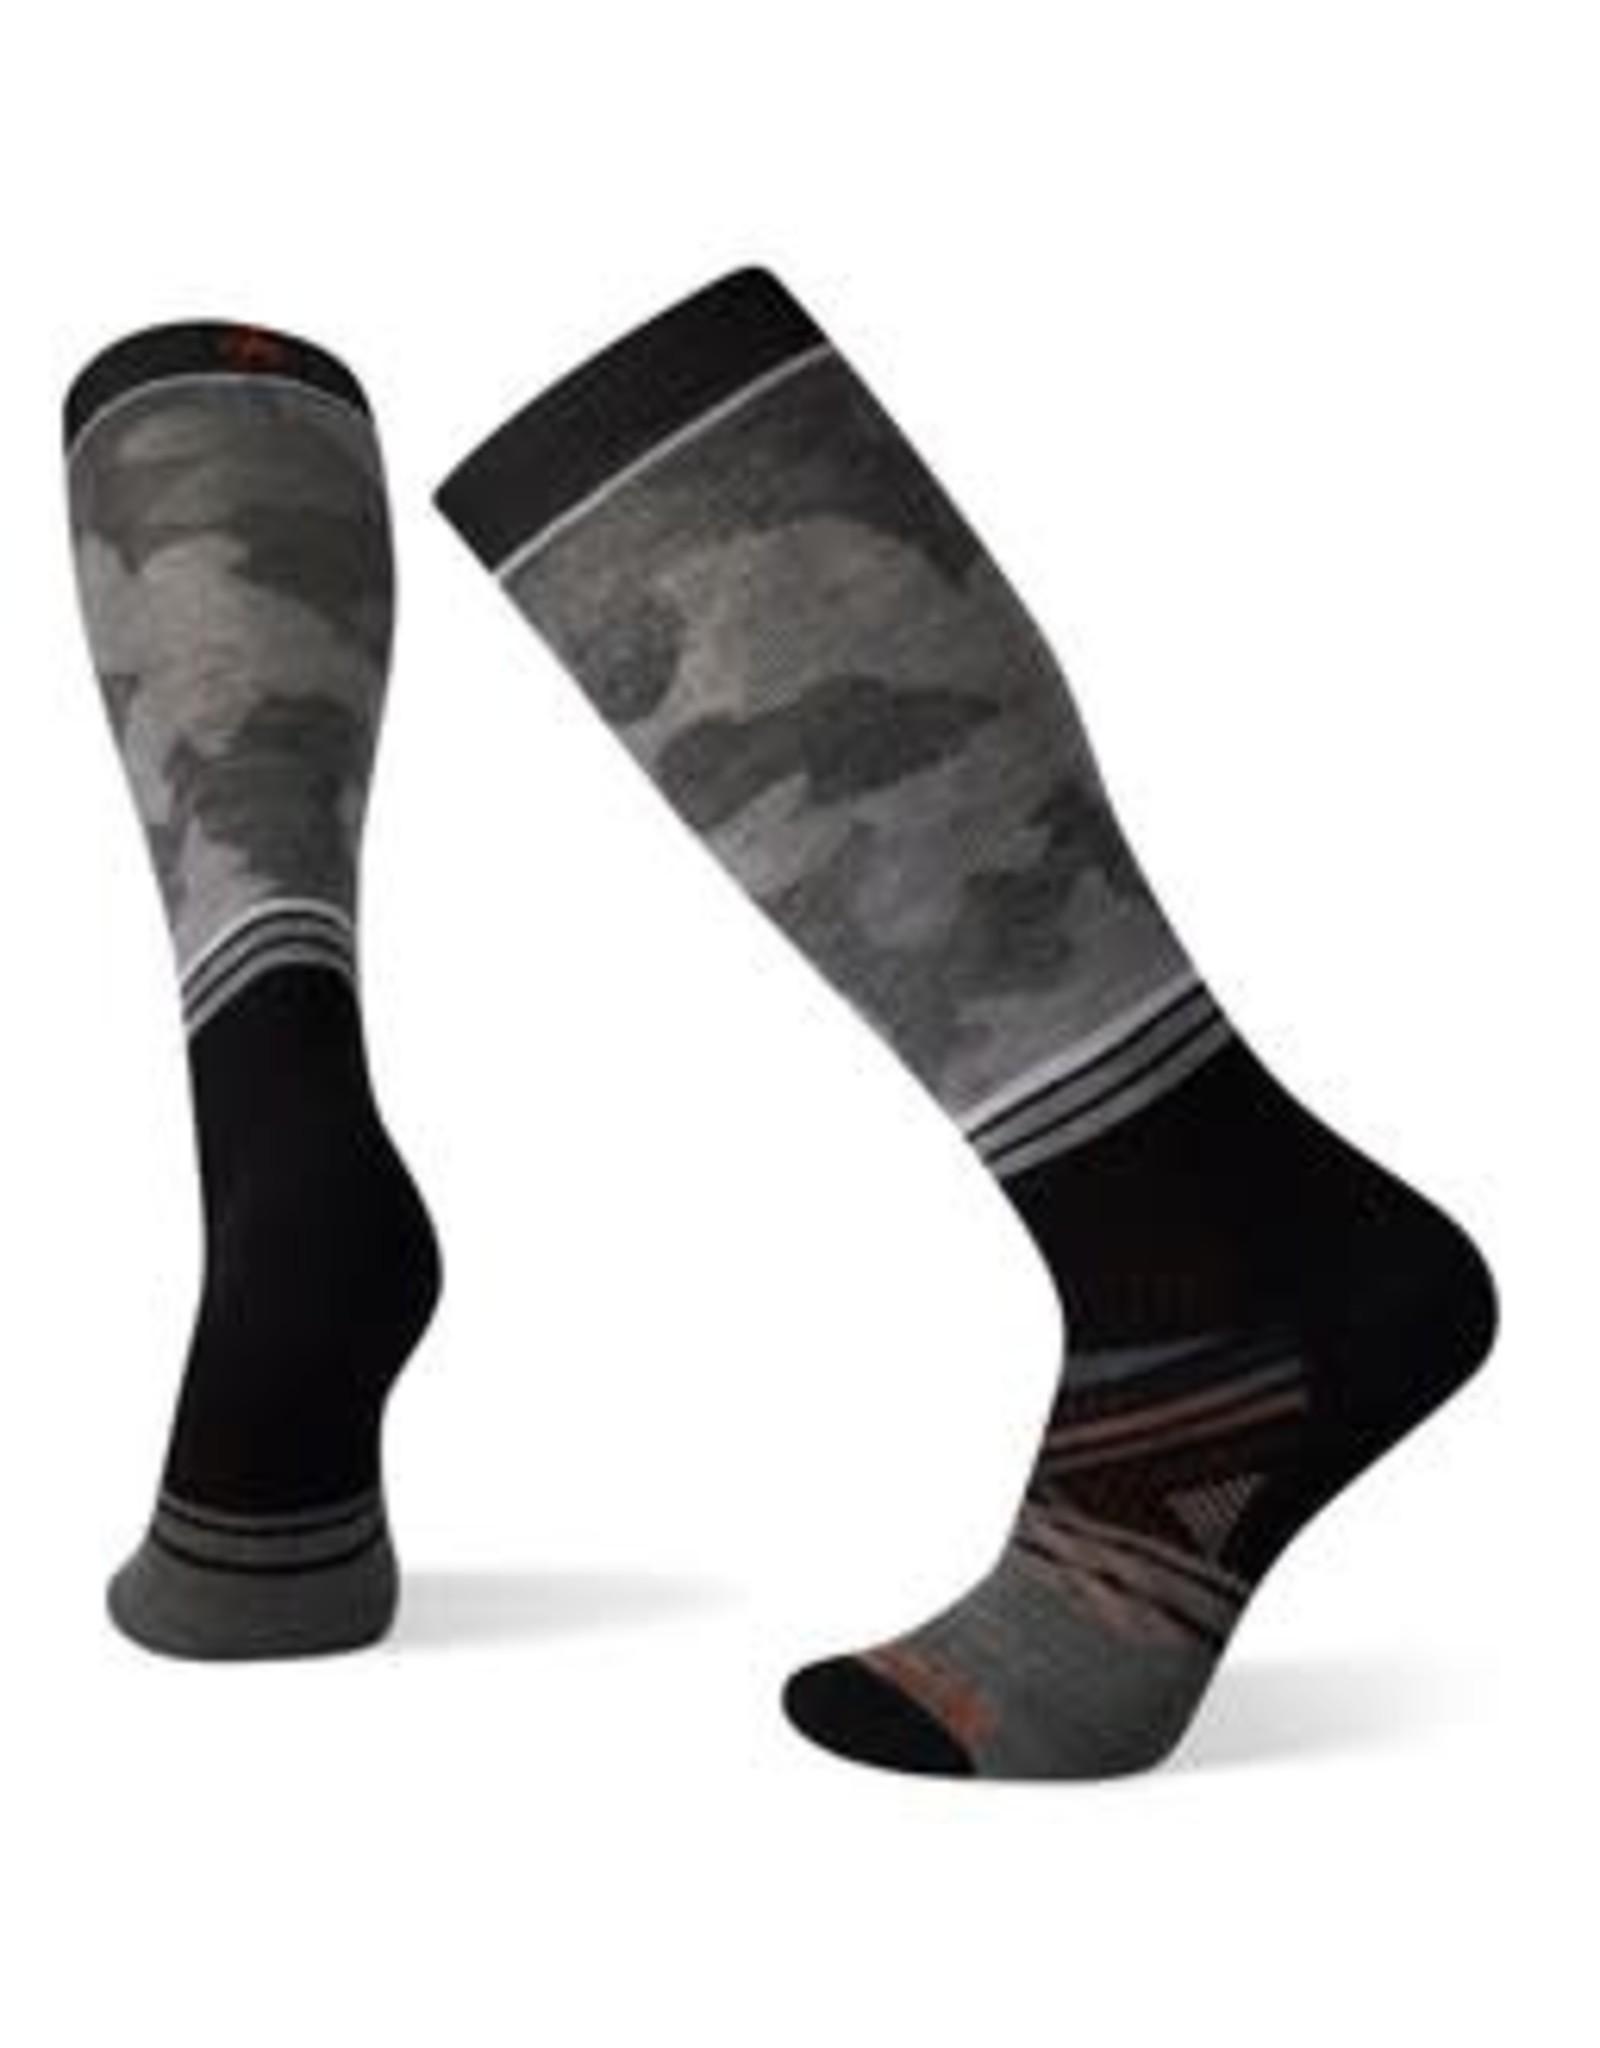 Smartwool Full Cushion Ski Sock